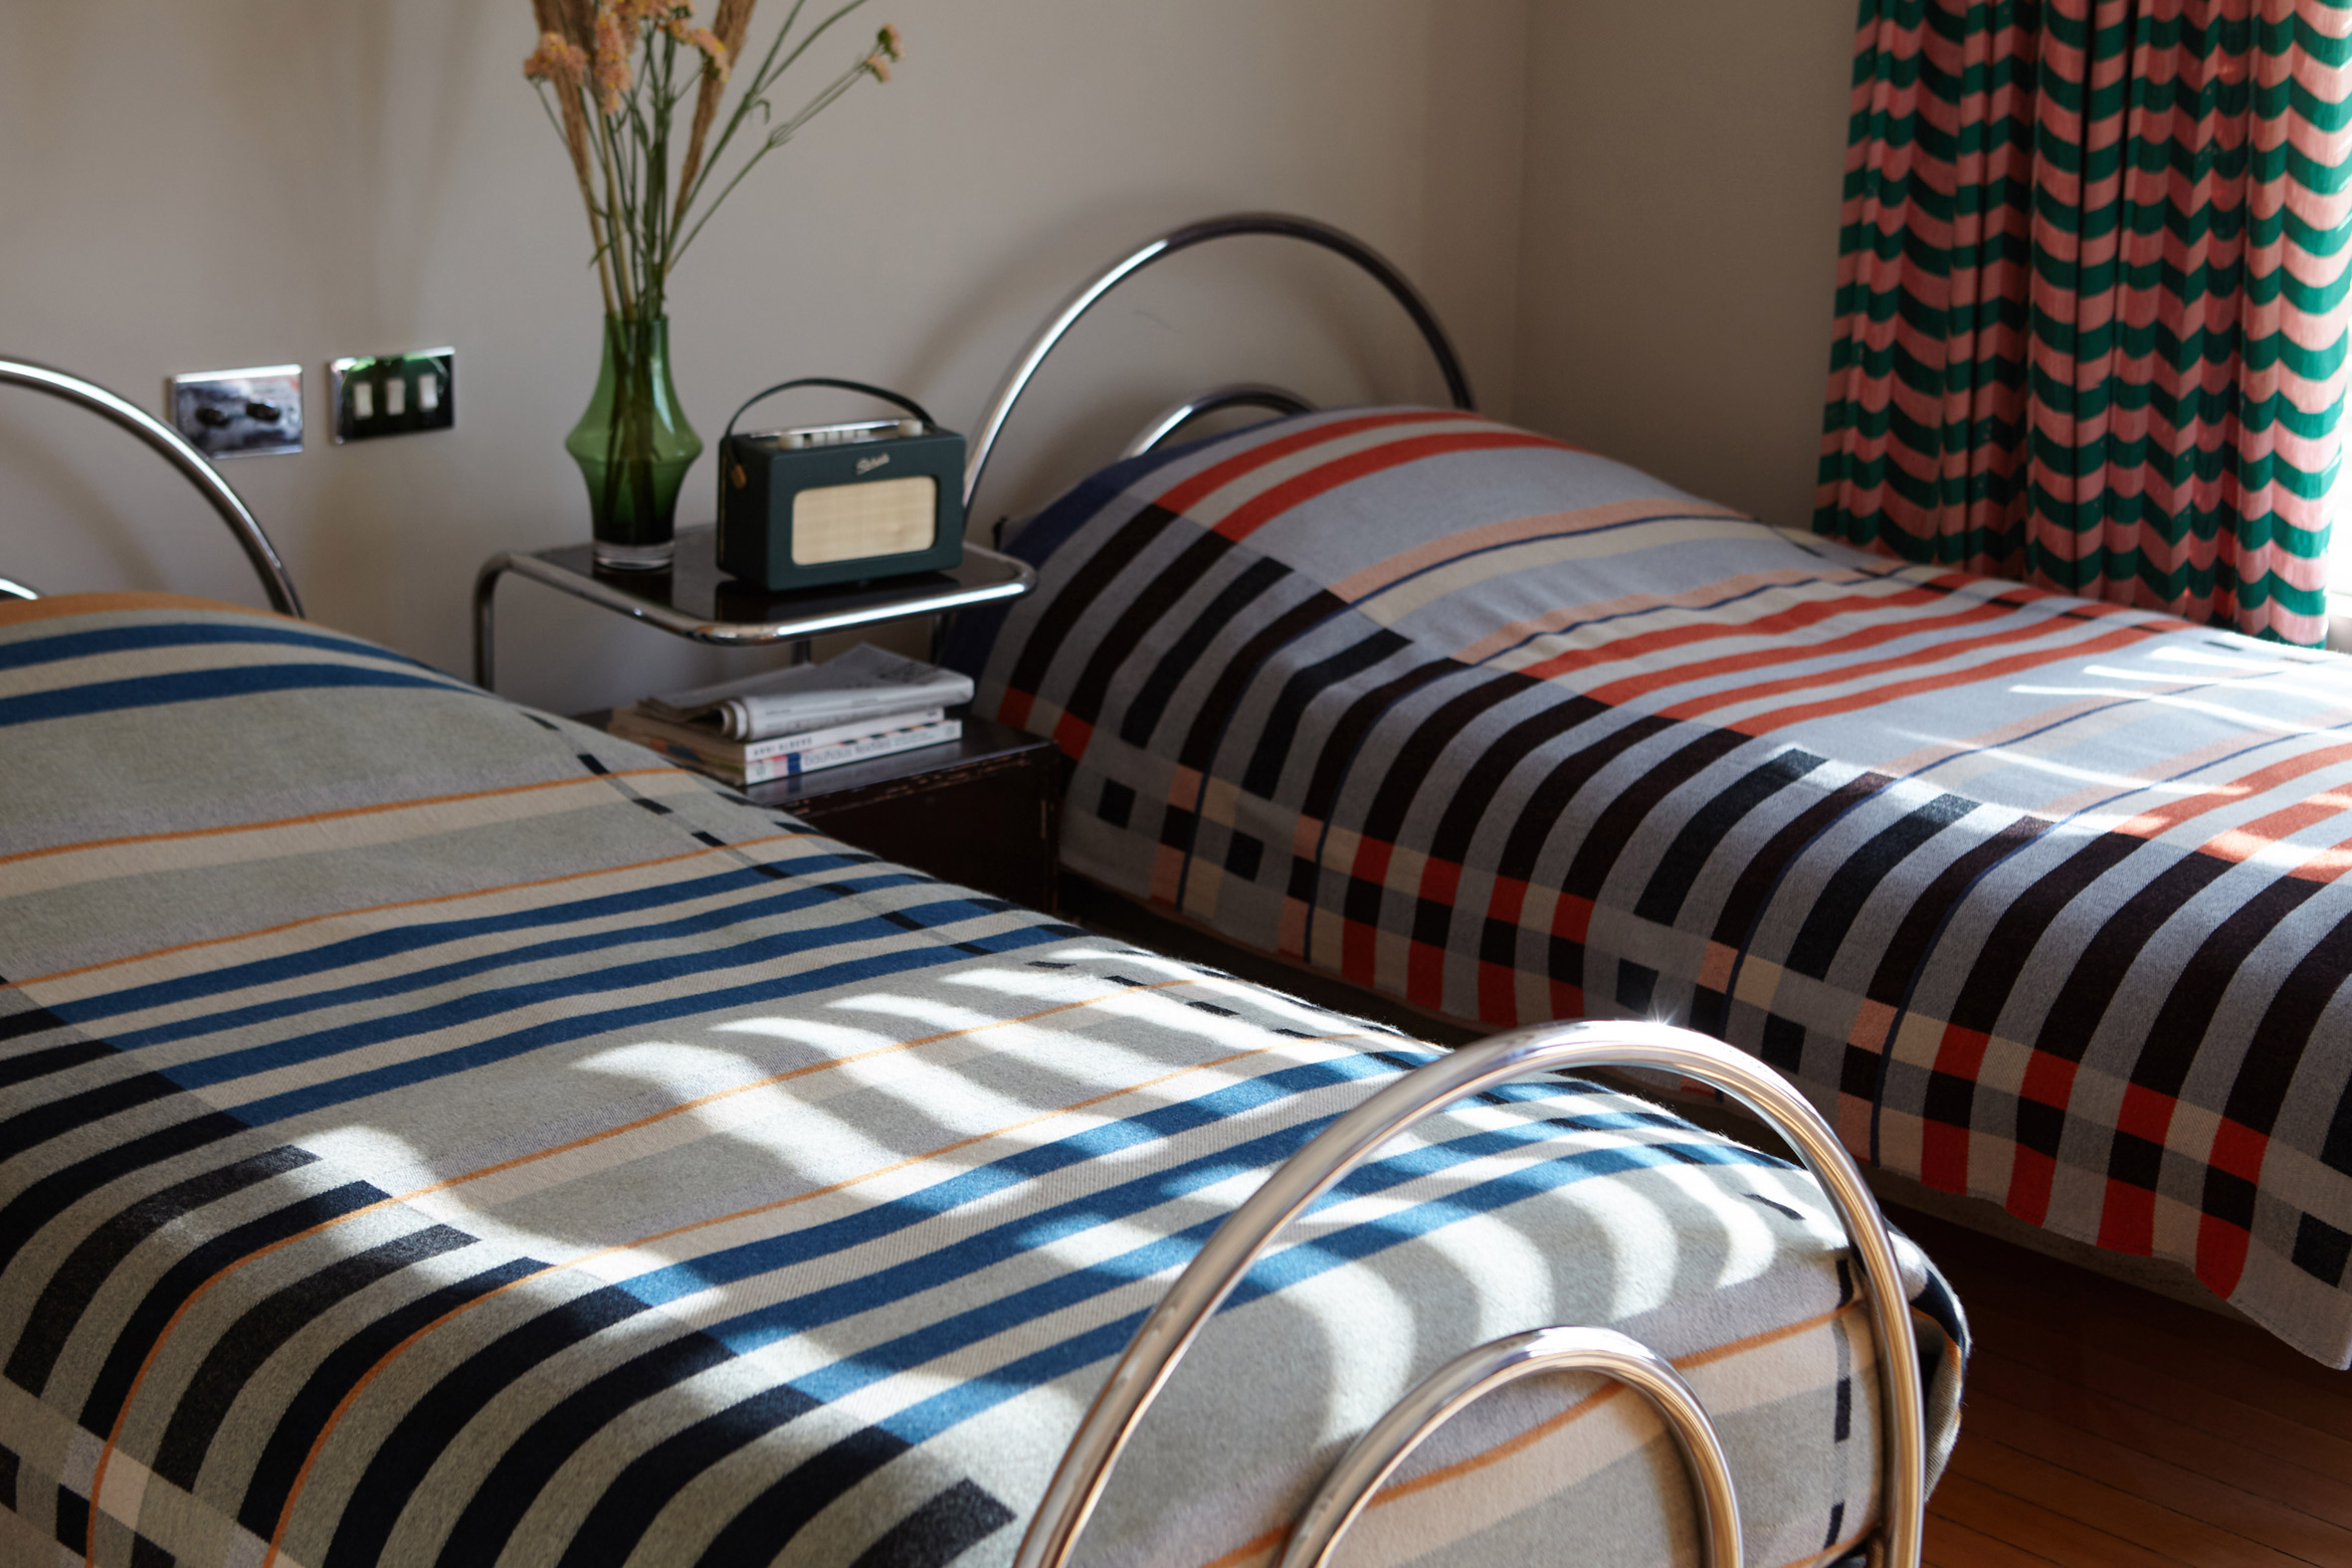 Gunta Stölzl's original Bauhaus dormitory blanket recreated by Wallace Sewell / more details via @kronekern